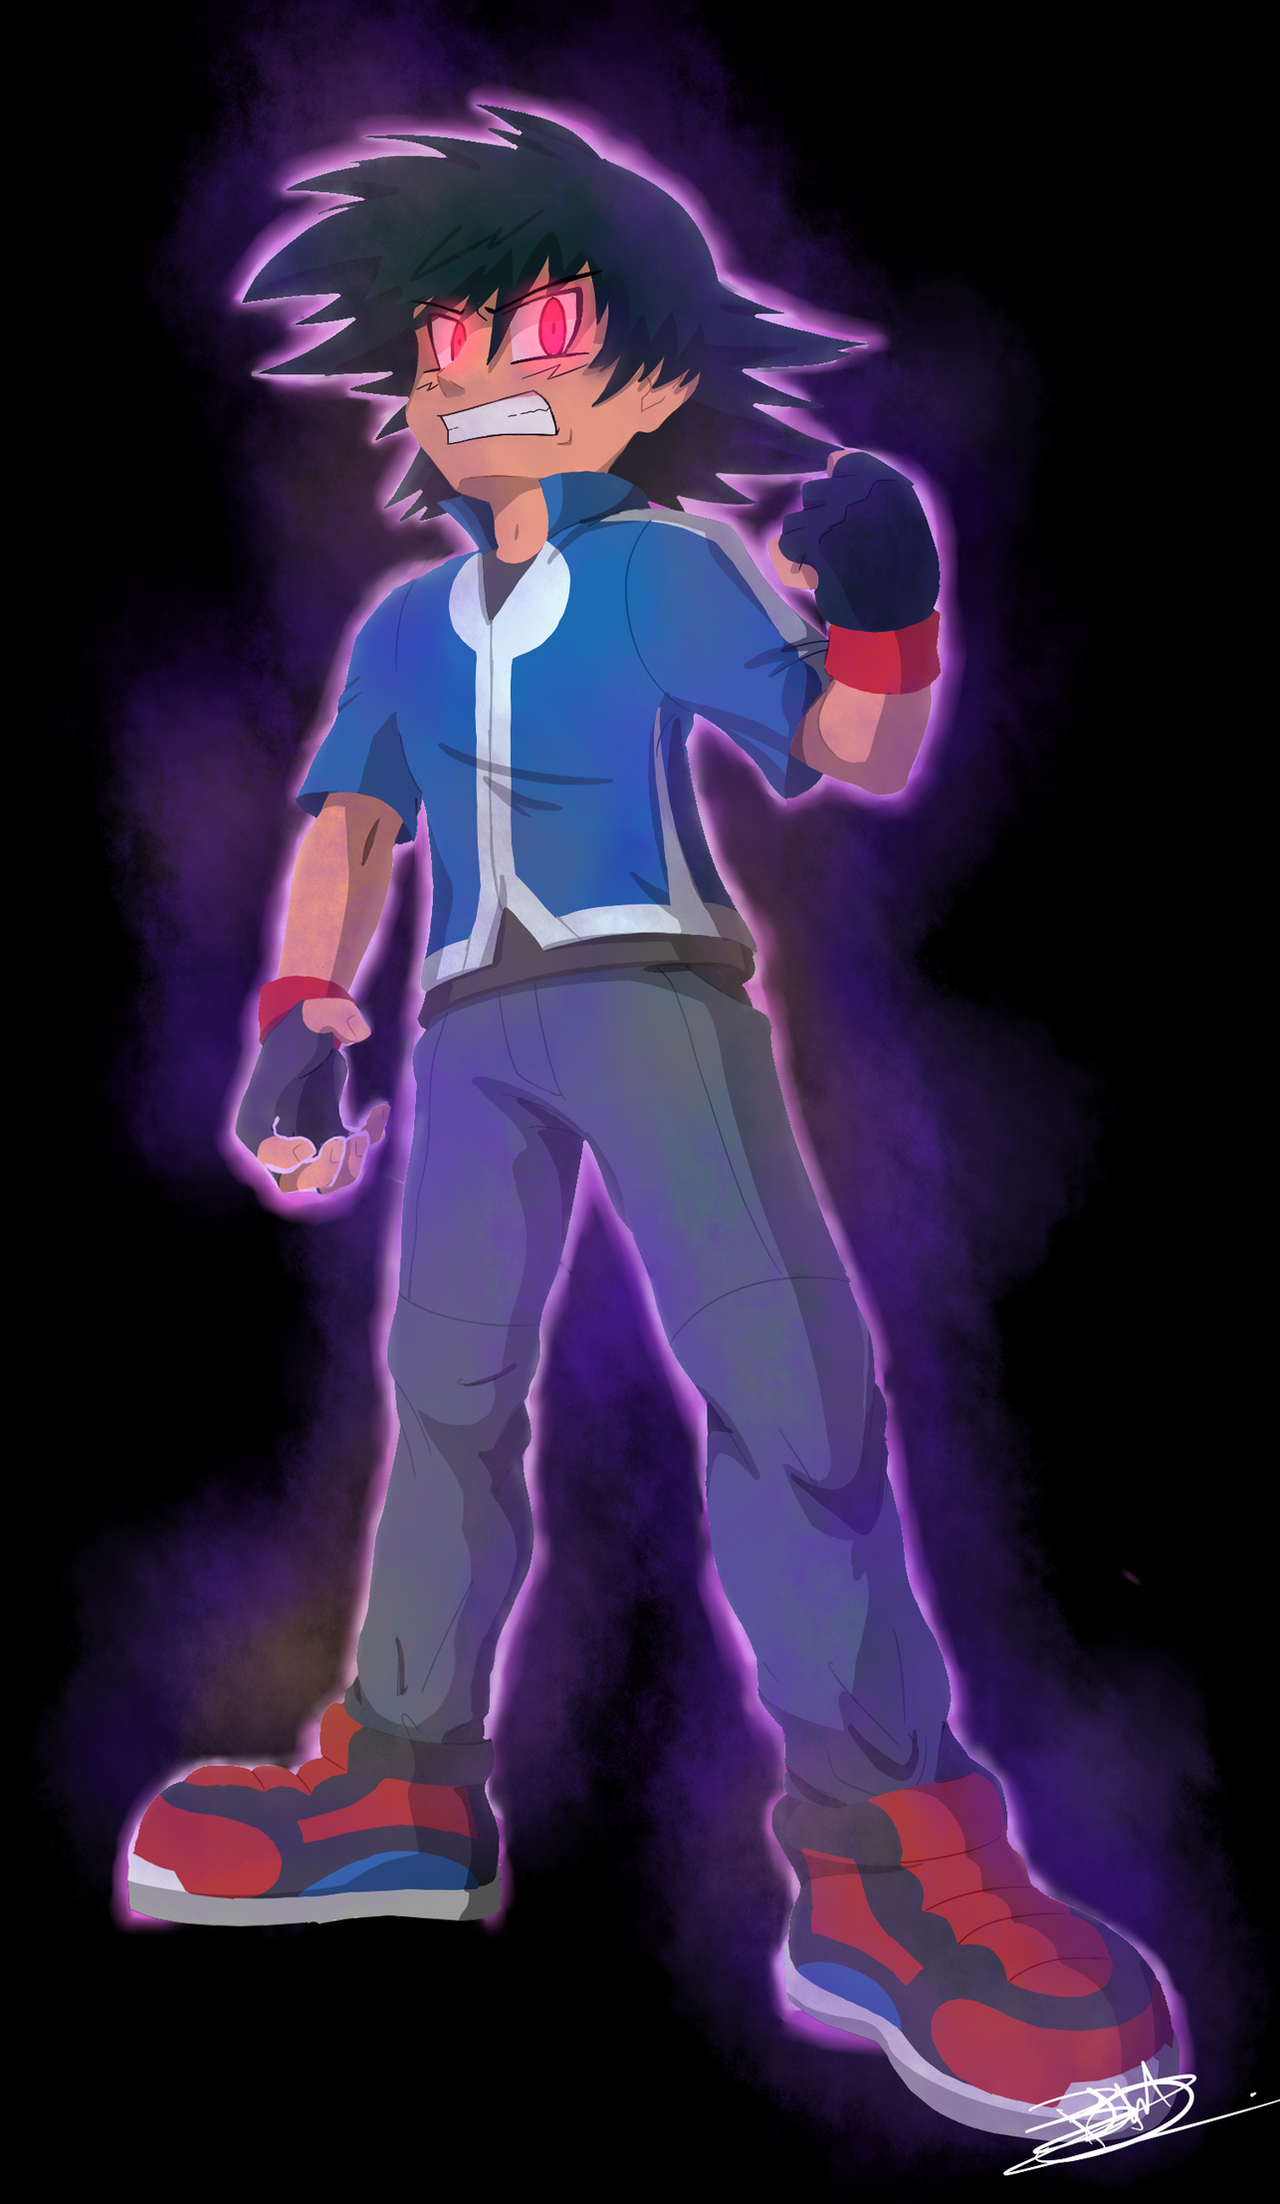 Yami Satoshi (Ash) by Estefanoida on DeviantArt